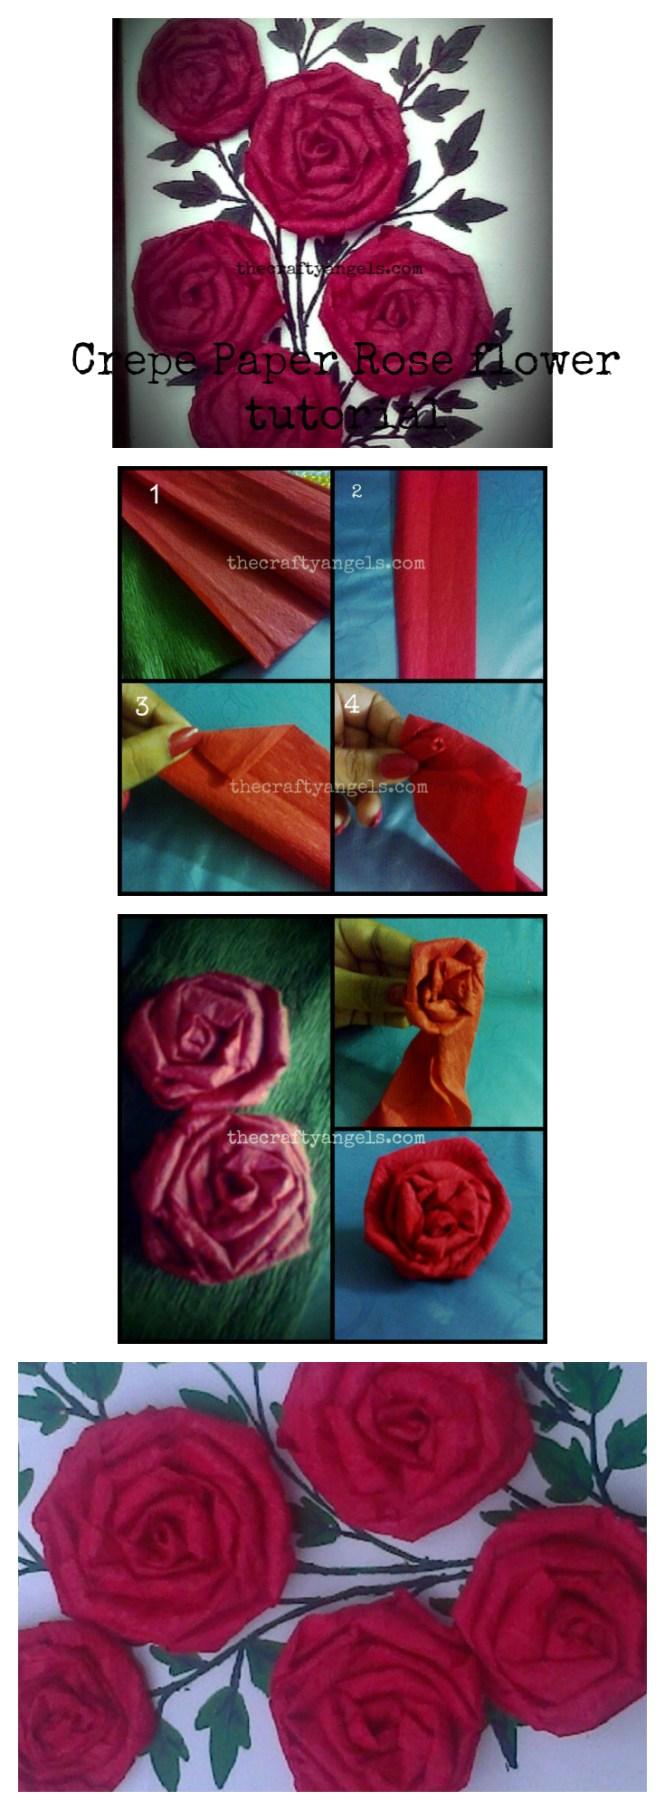 Crepe paper rose flower tutorial collage